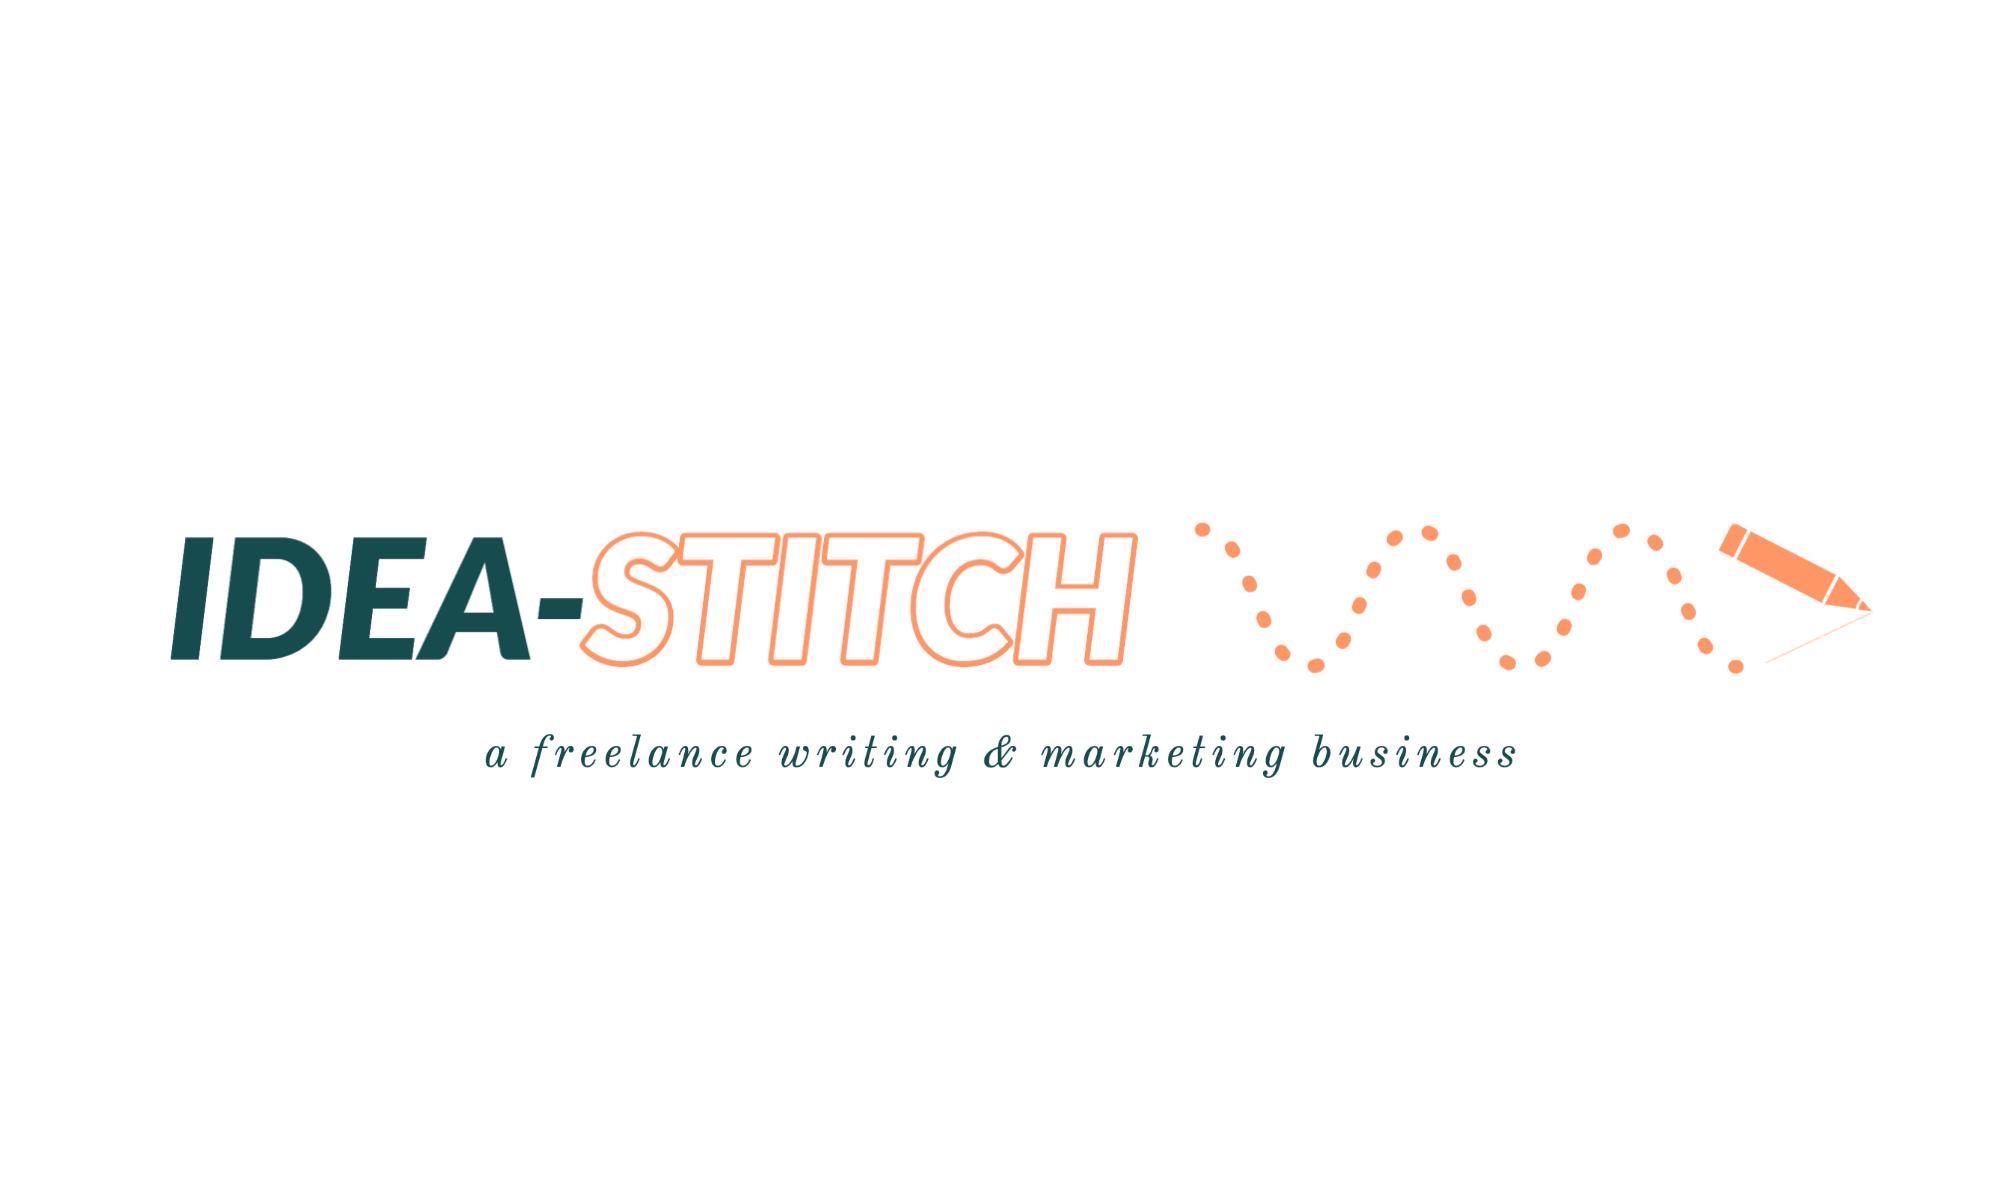 Idea-Stitch